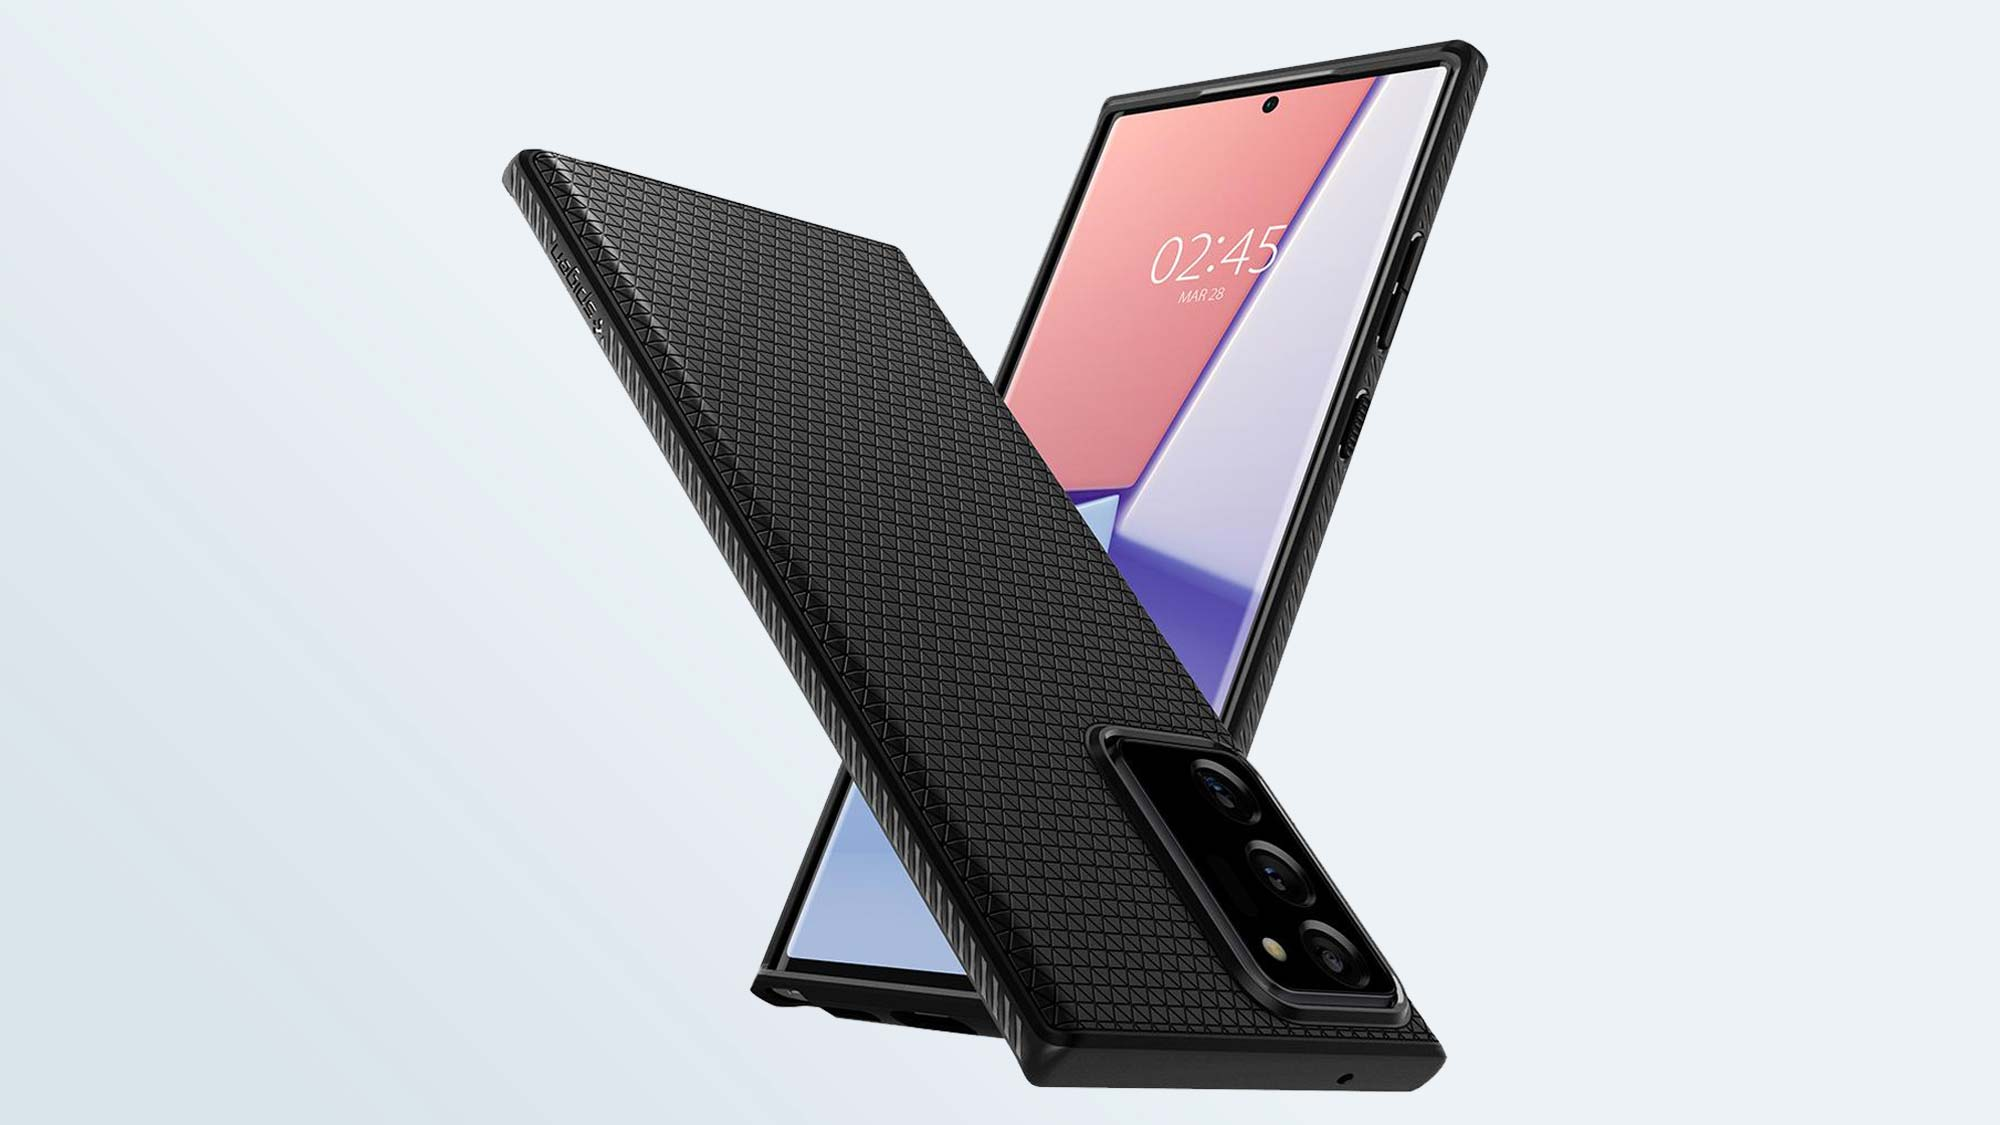 Лучшие чехлы для Samsung Galaxy Note 20 Ultra: чехол Spigen Liquid Air